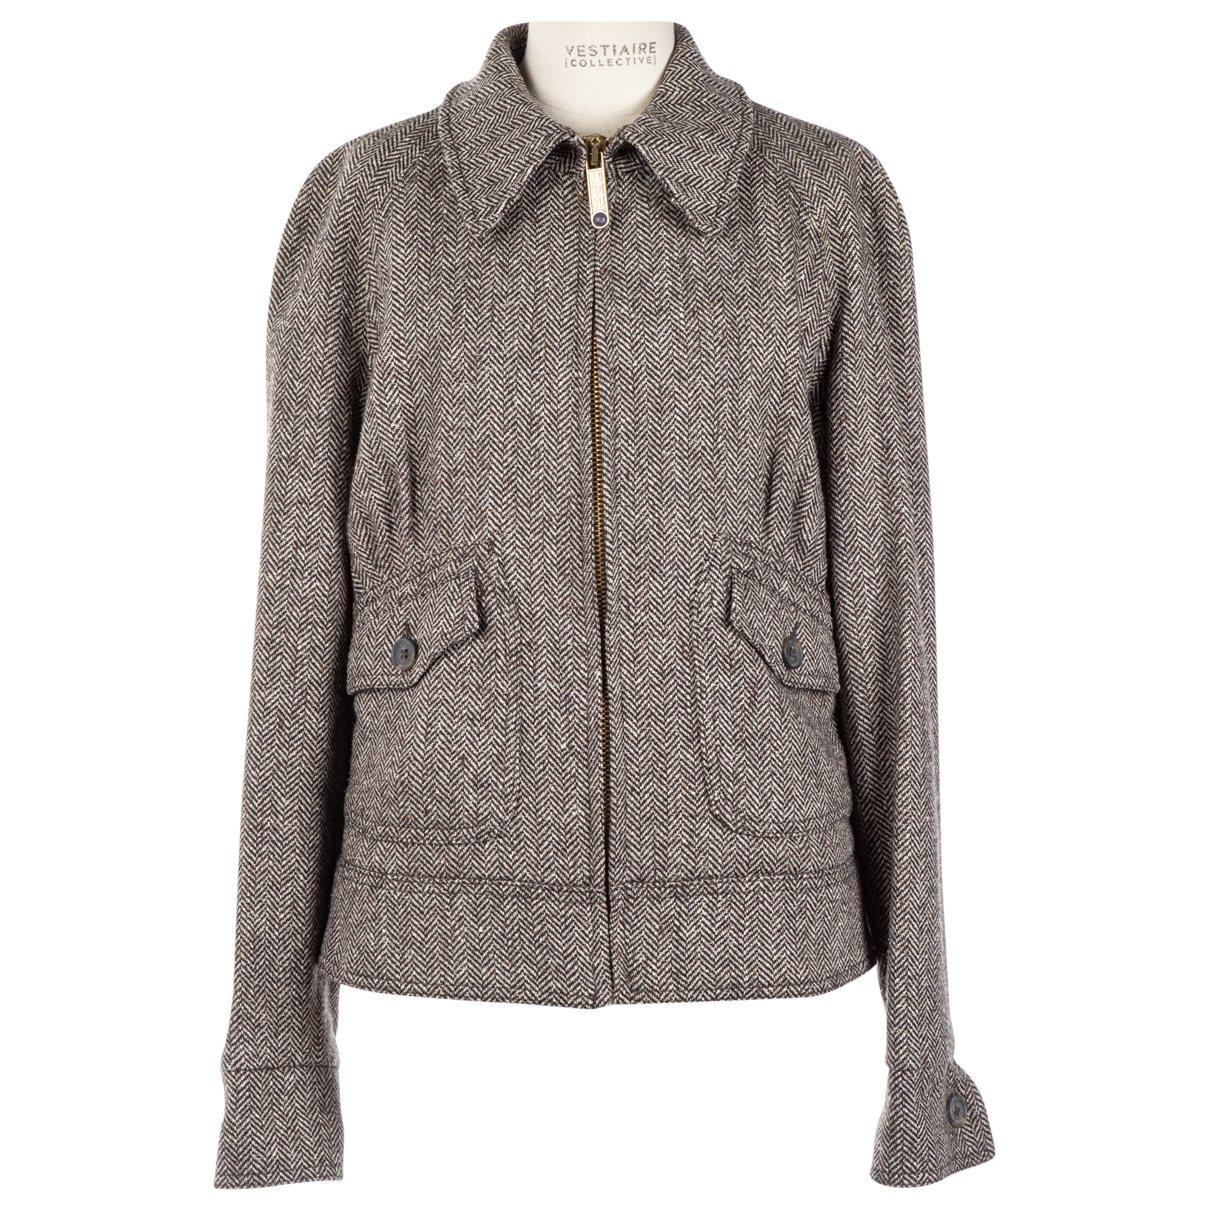 Red Valentino Garavani N Brown Wool jacket for Women 42 IT